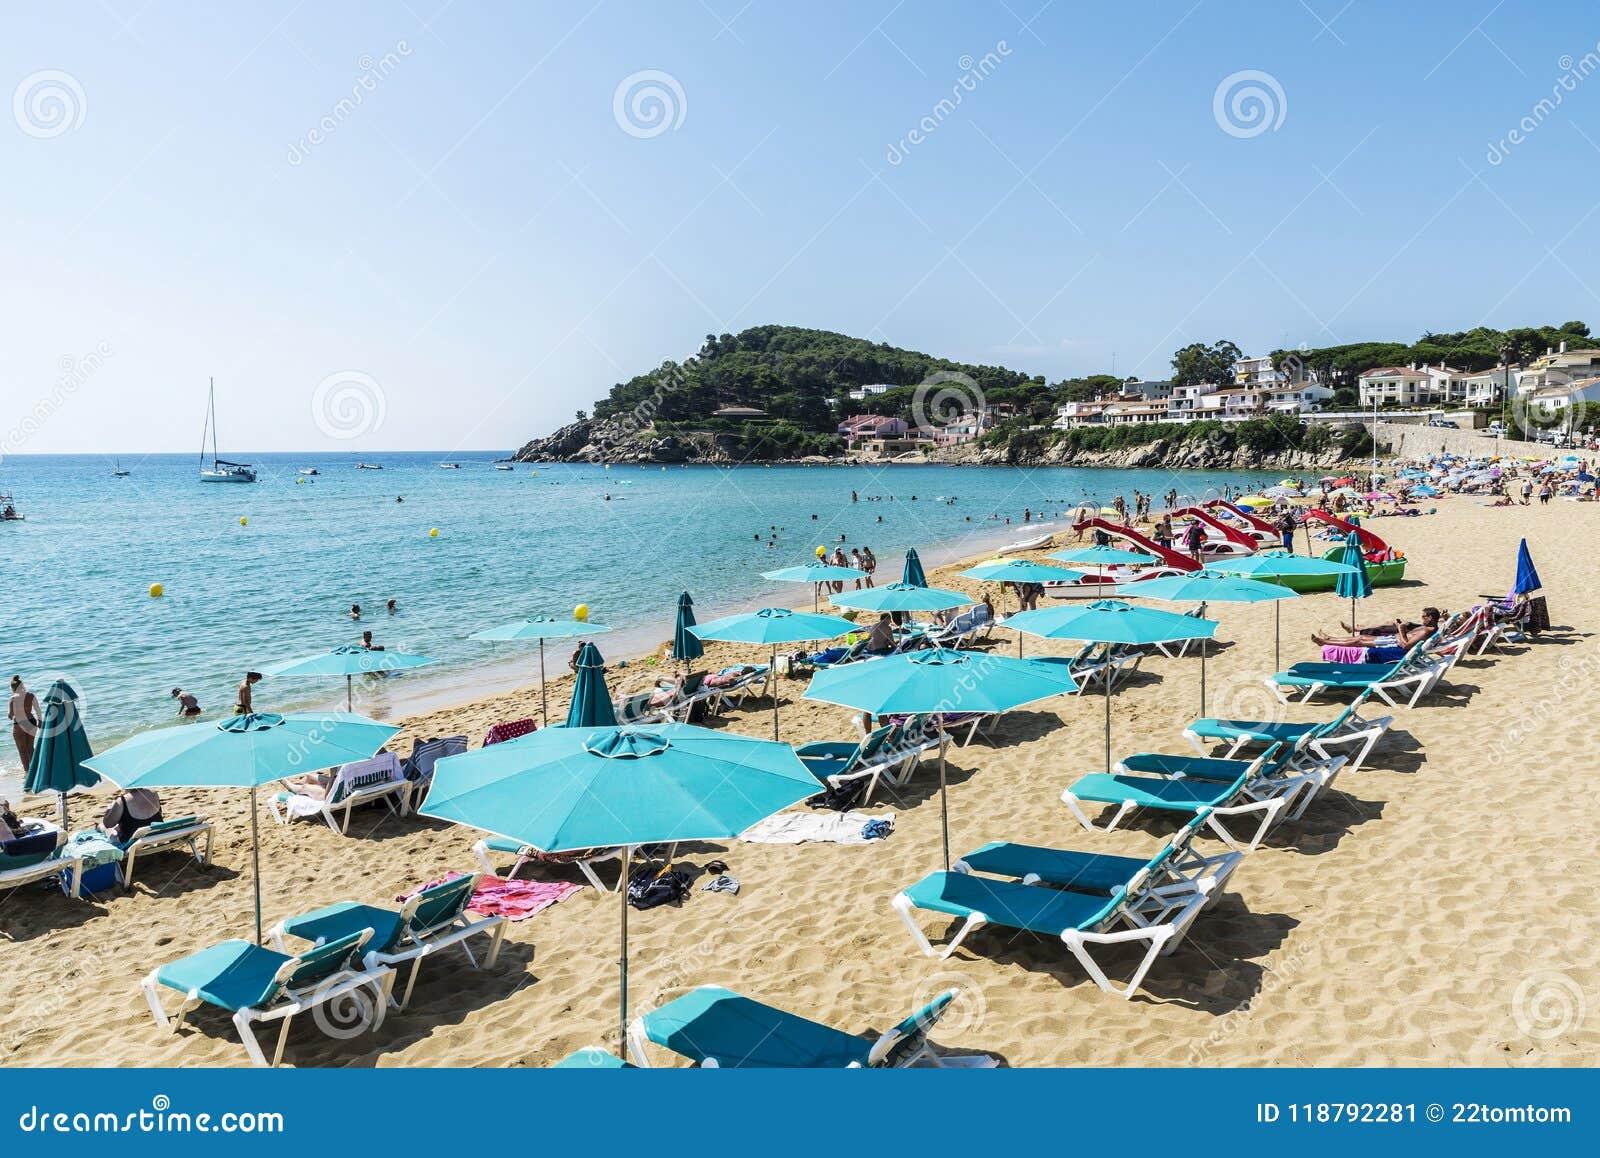 La Fosca Beach Costa Brava Girona Catalonia Spain Editorial